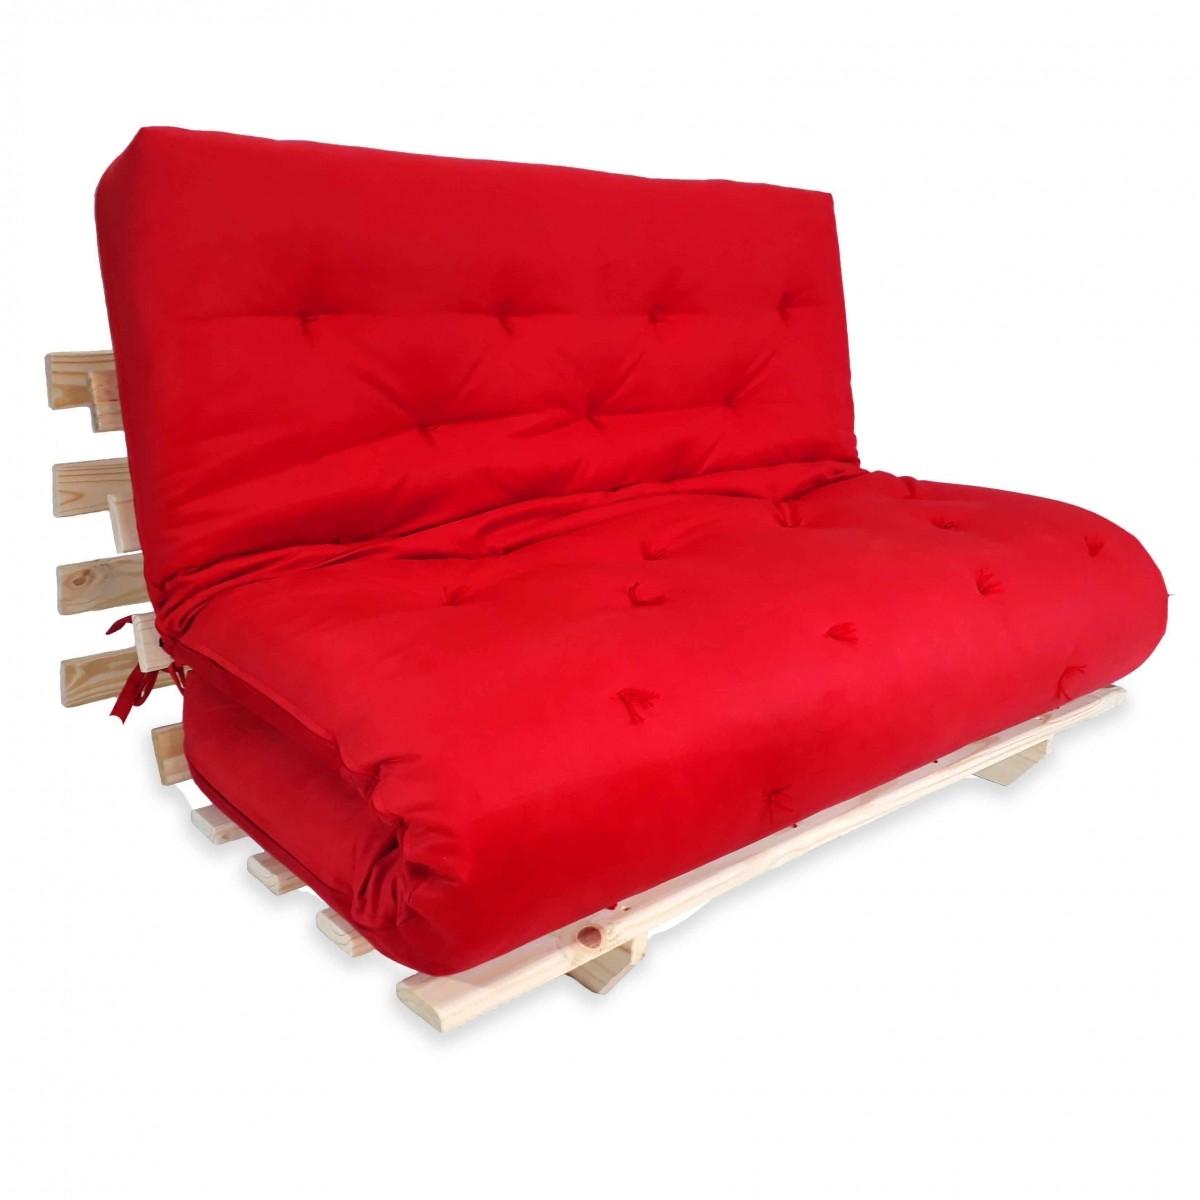 sofa cama futon. Black Bedroom Furniture Sets. Home Design Ideas